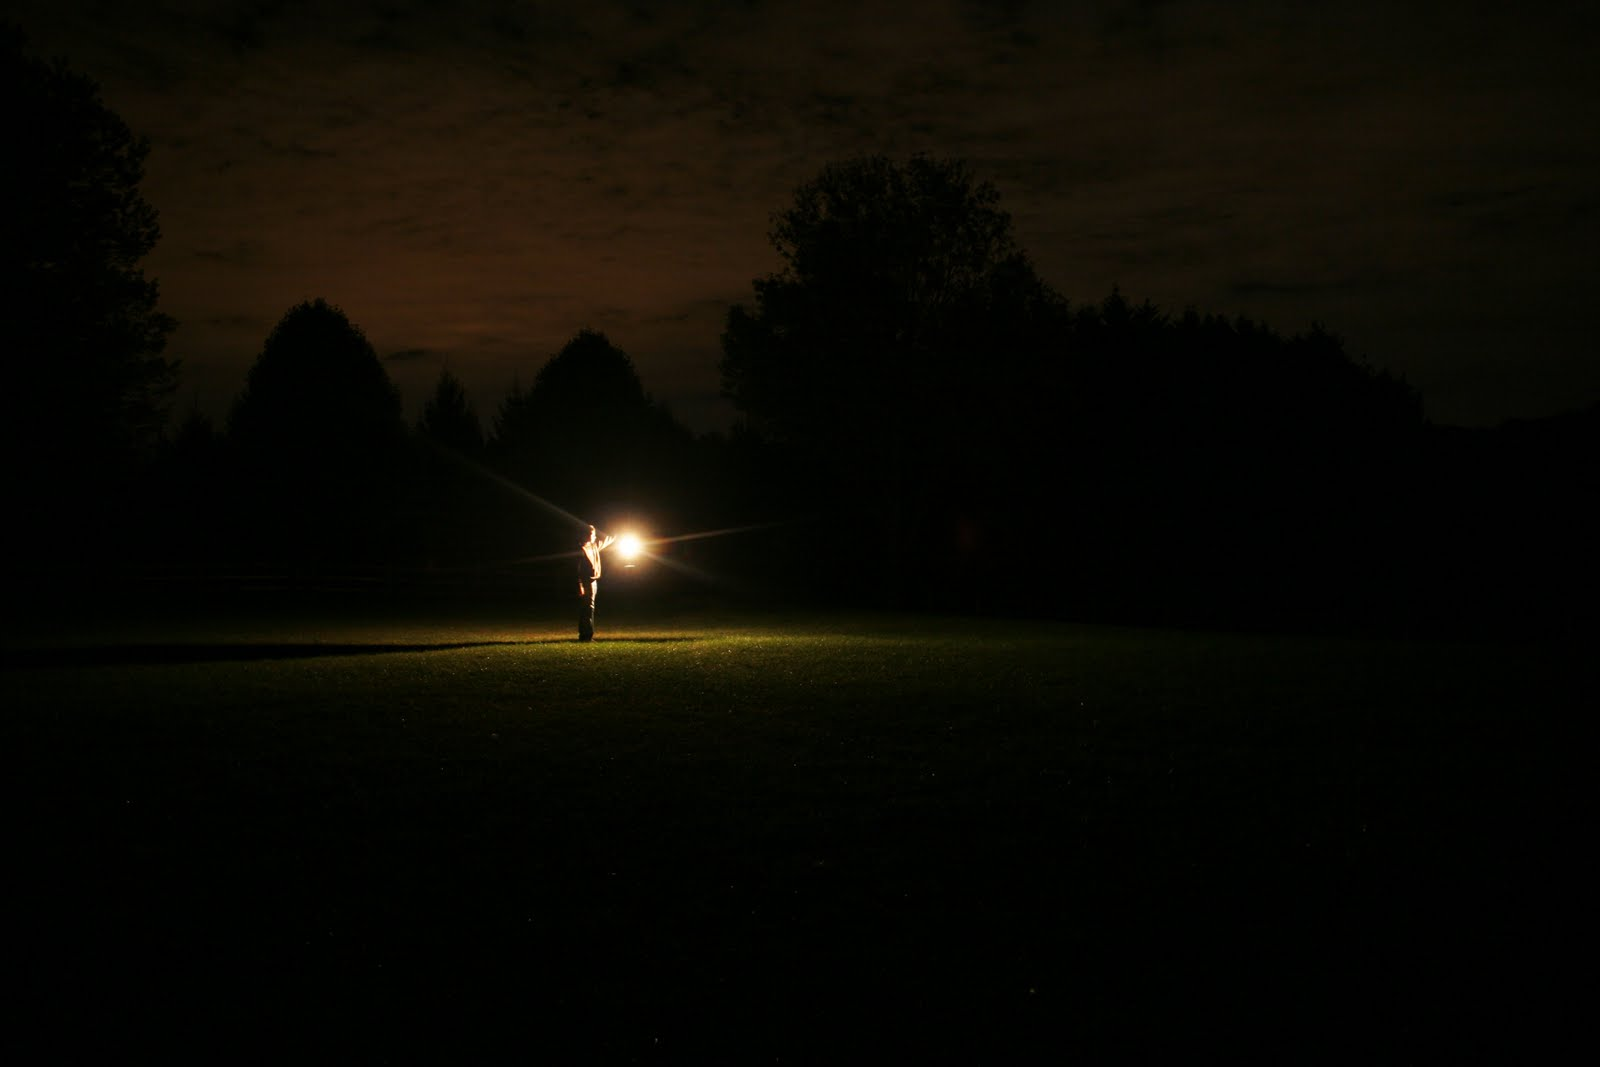 light_in_dark.jpg